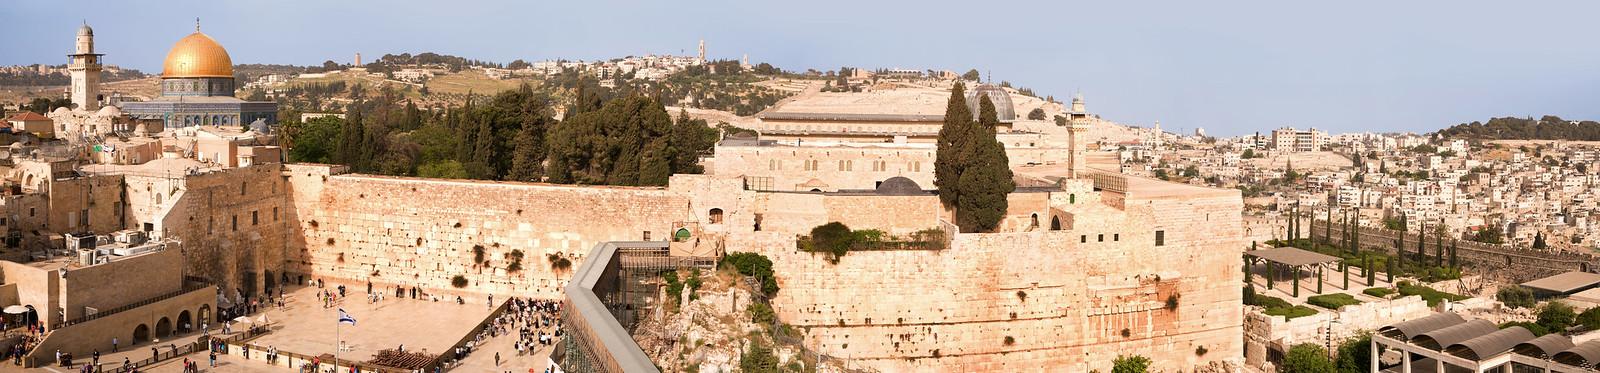 Jerusalem_Western Wall_11_Noam Chen_IMOT